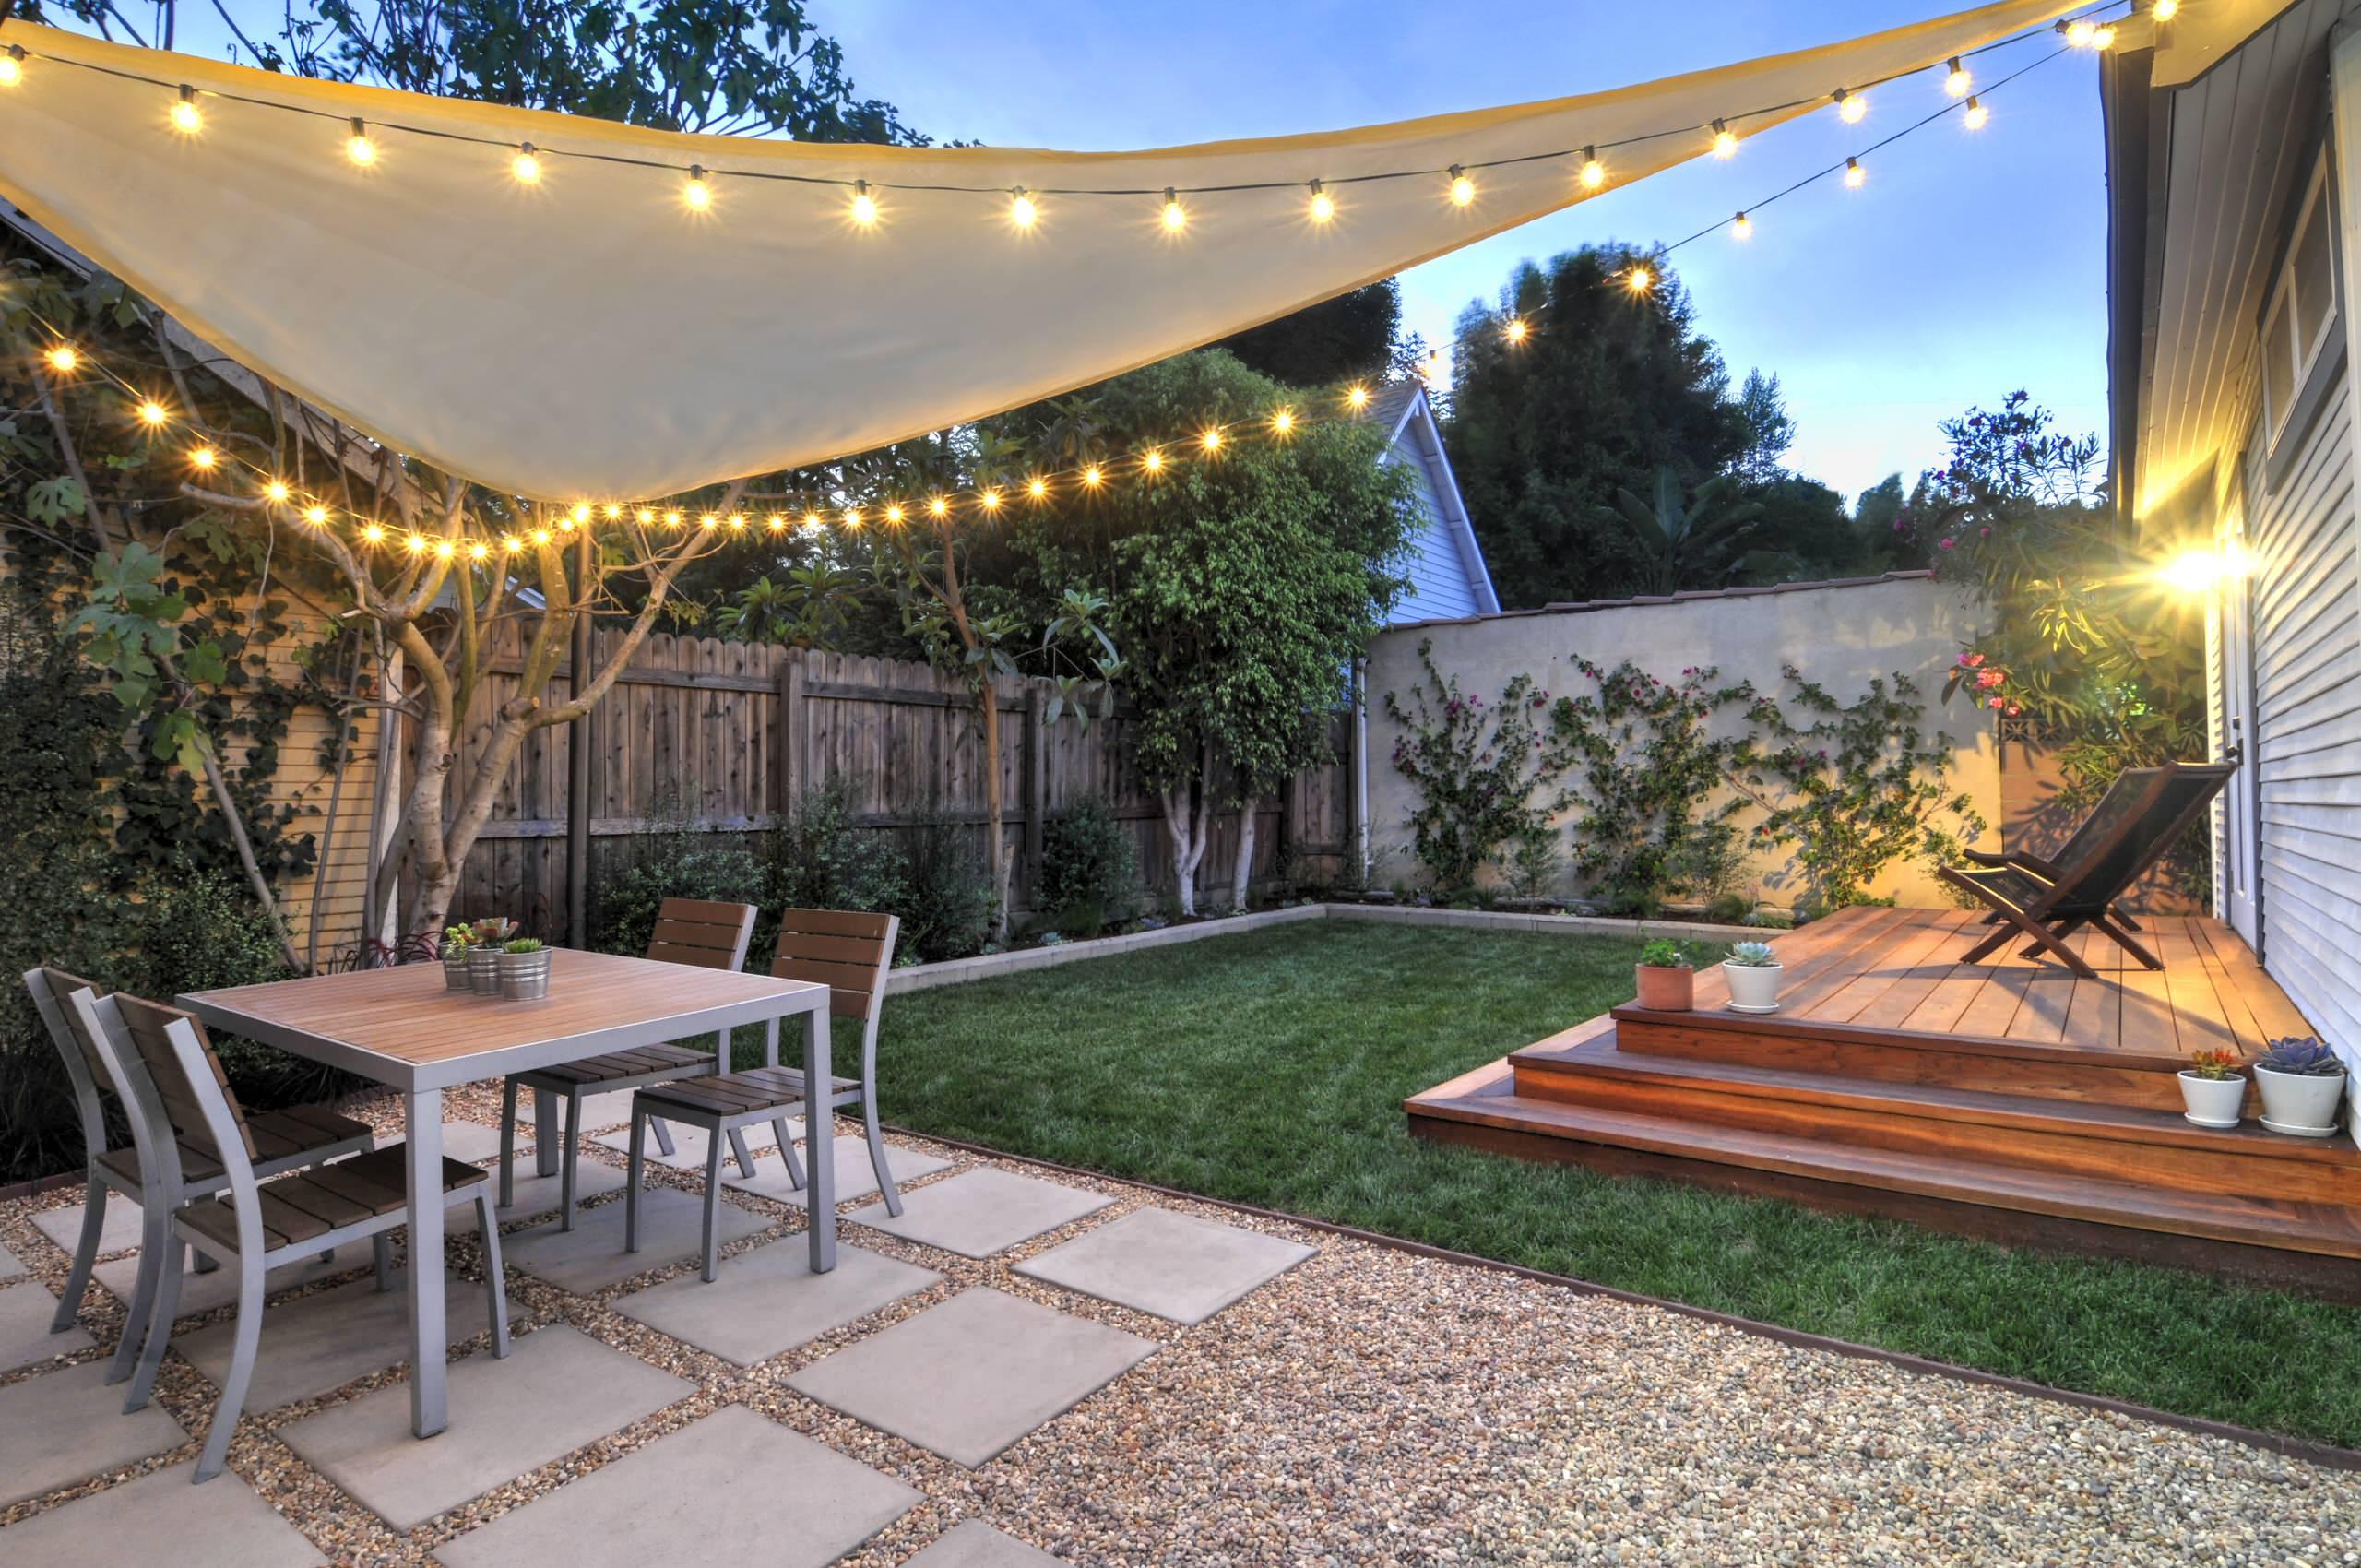 patio porch sod plantings a